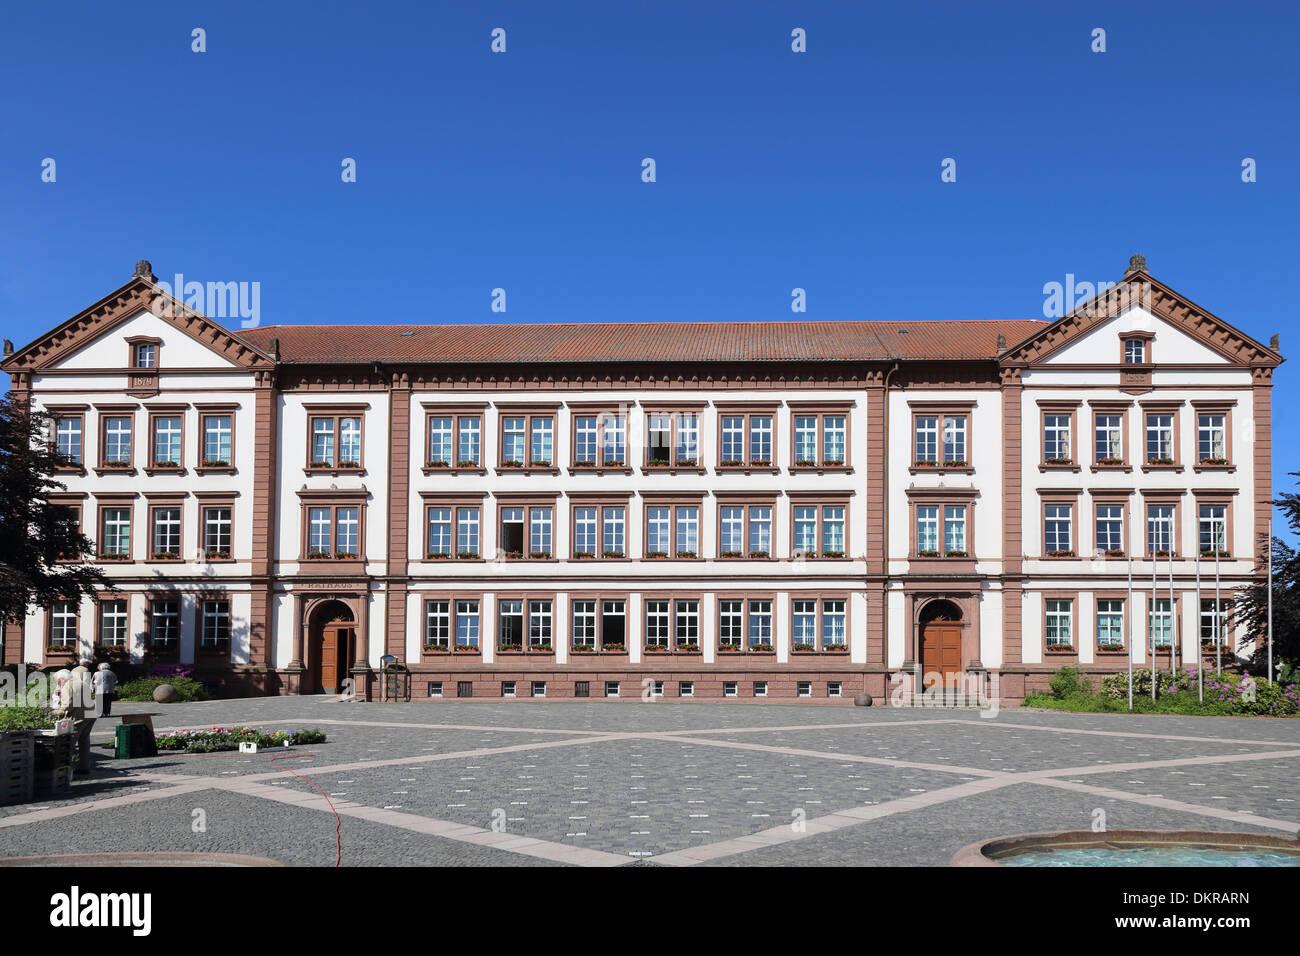 Pirmasens town hall - Stock Image